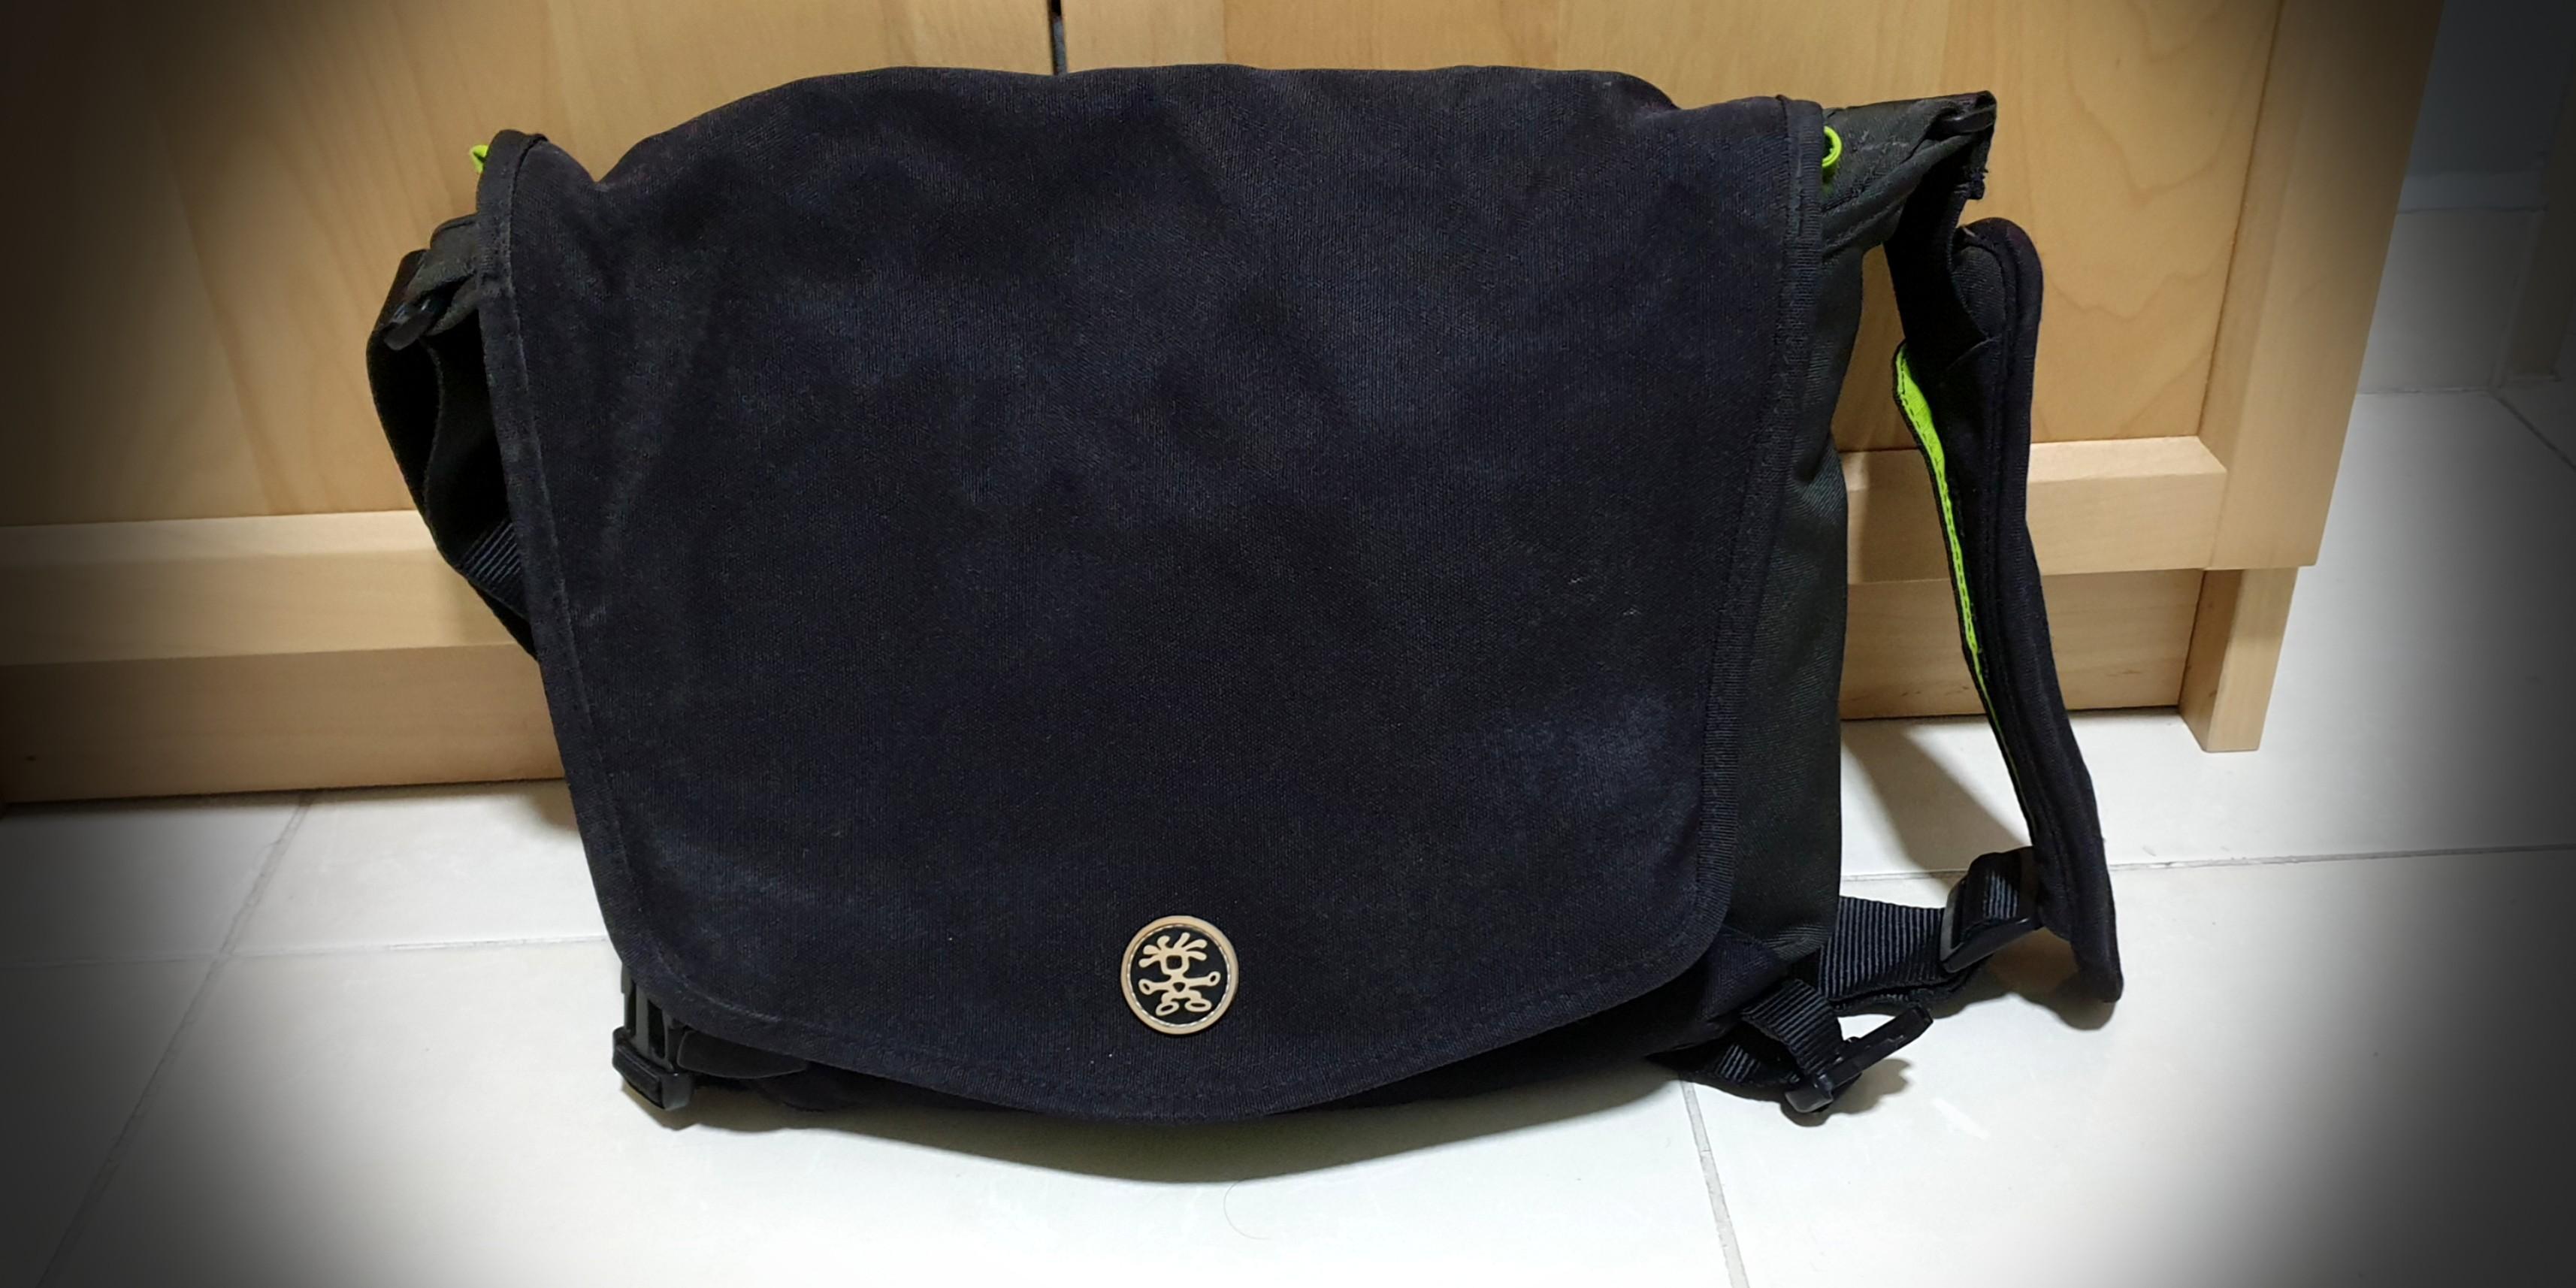 94b84f3c228e Crumpler Messenger Bag, Men's Fashion, Bags & Wallets, Sling Bags on ...